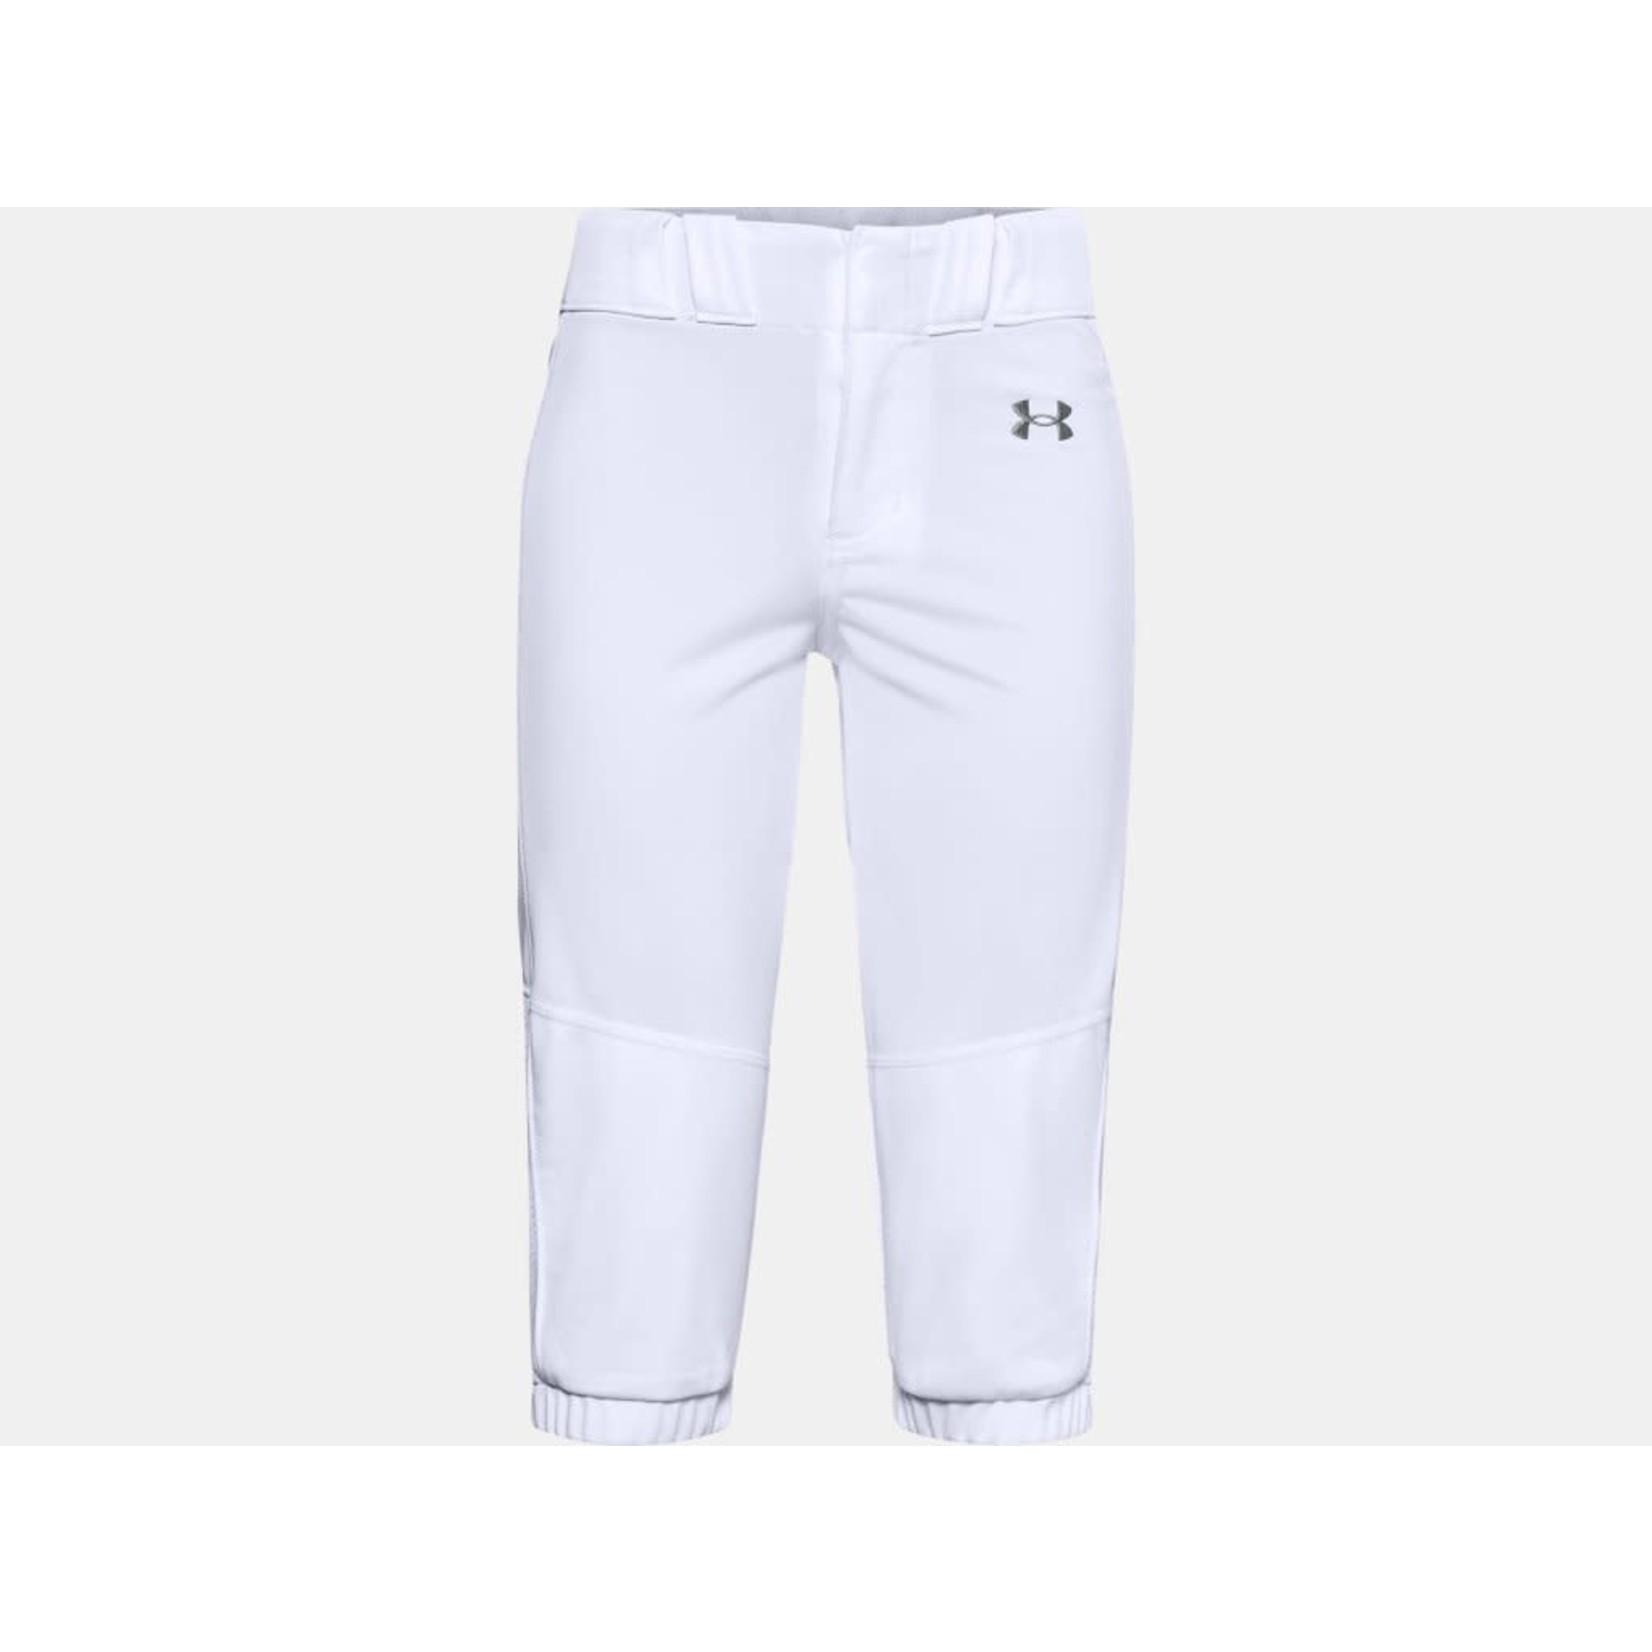 Under Armour Under Armour Baseball Pants, Softball Vanish, Girls